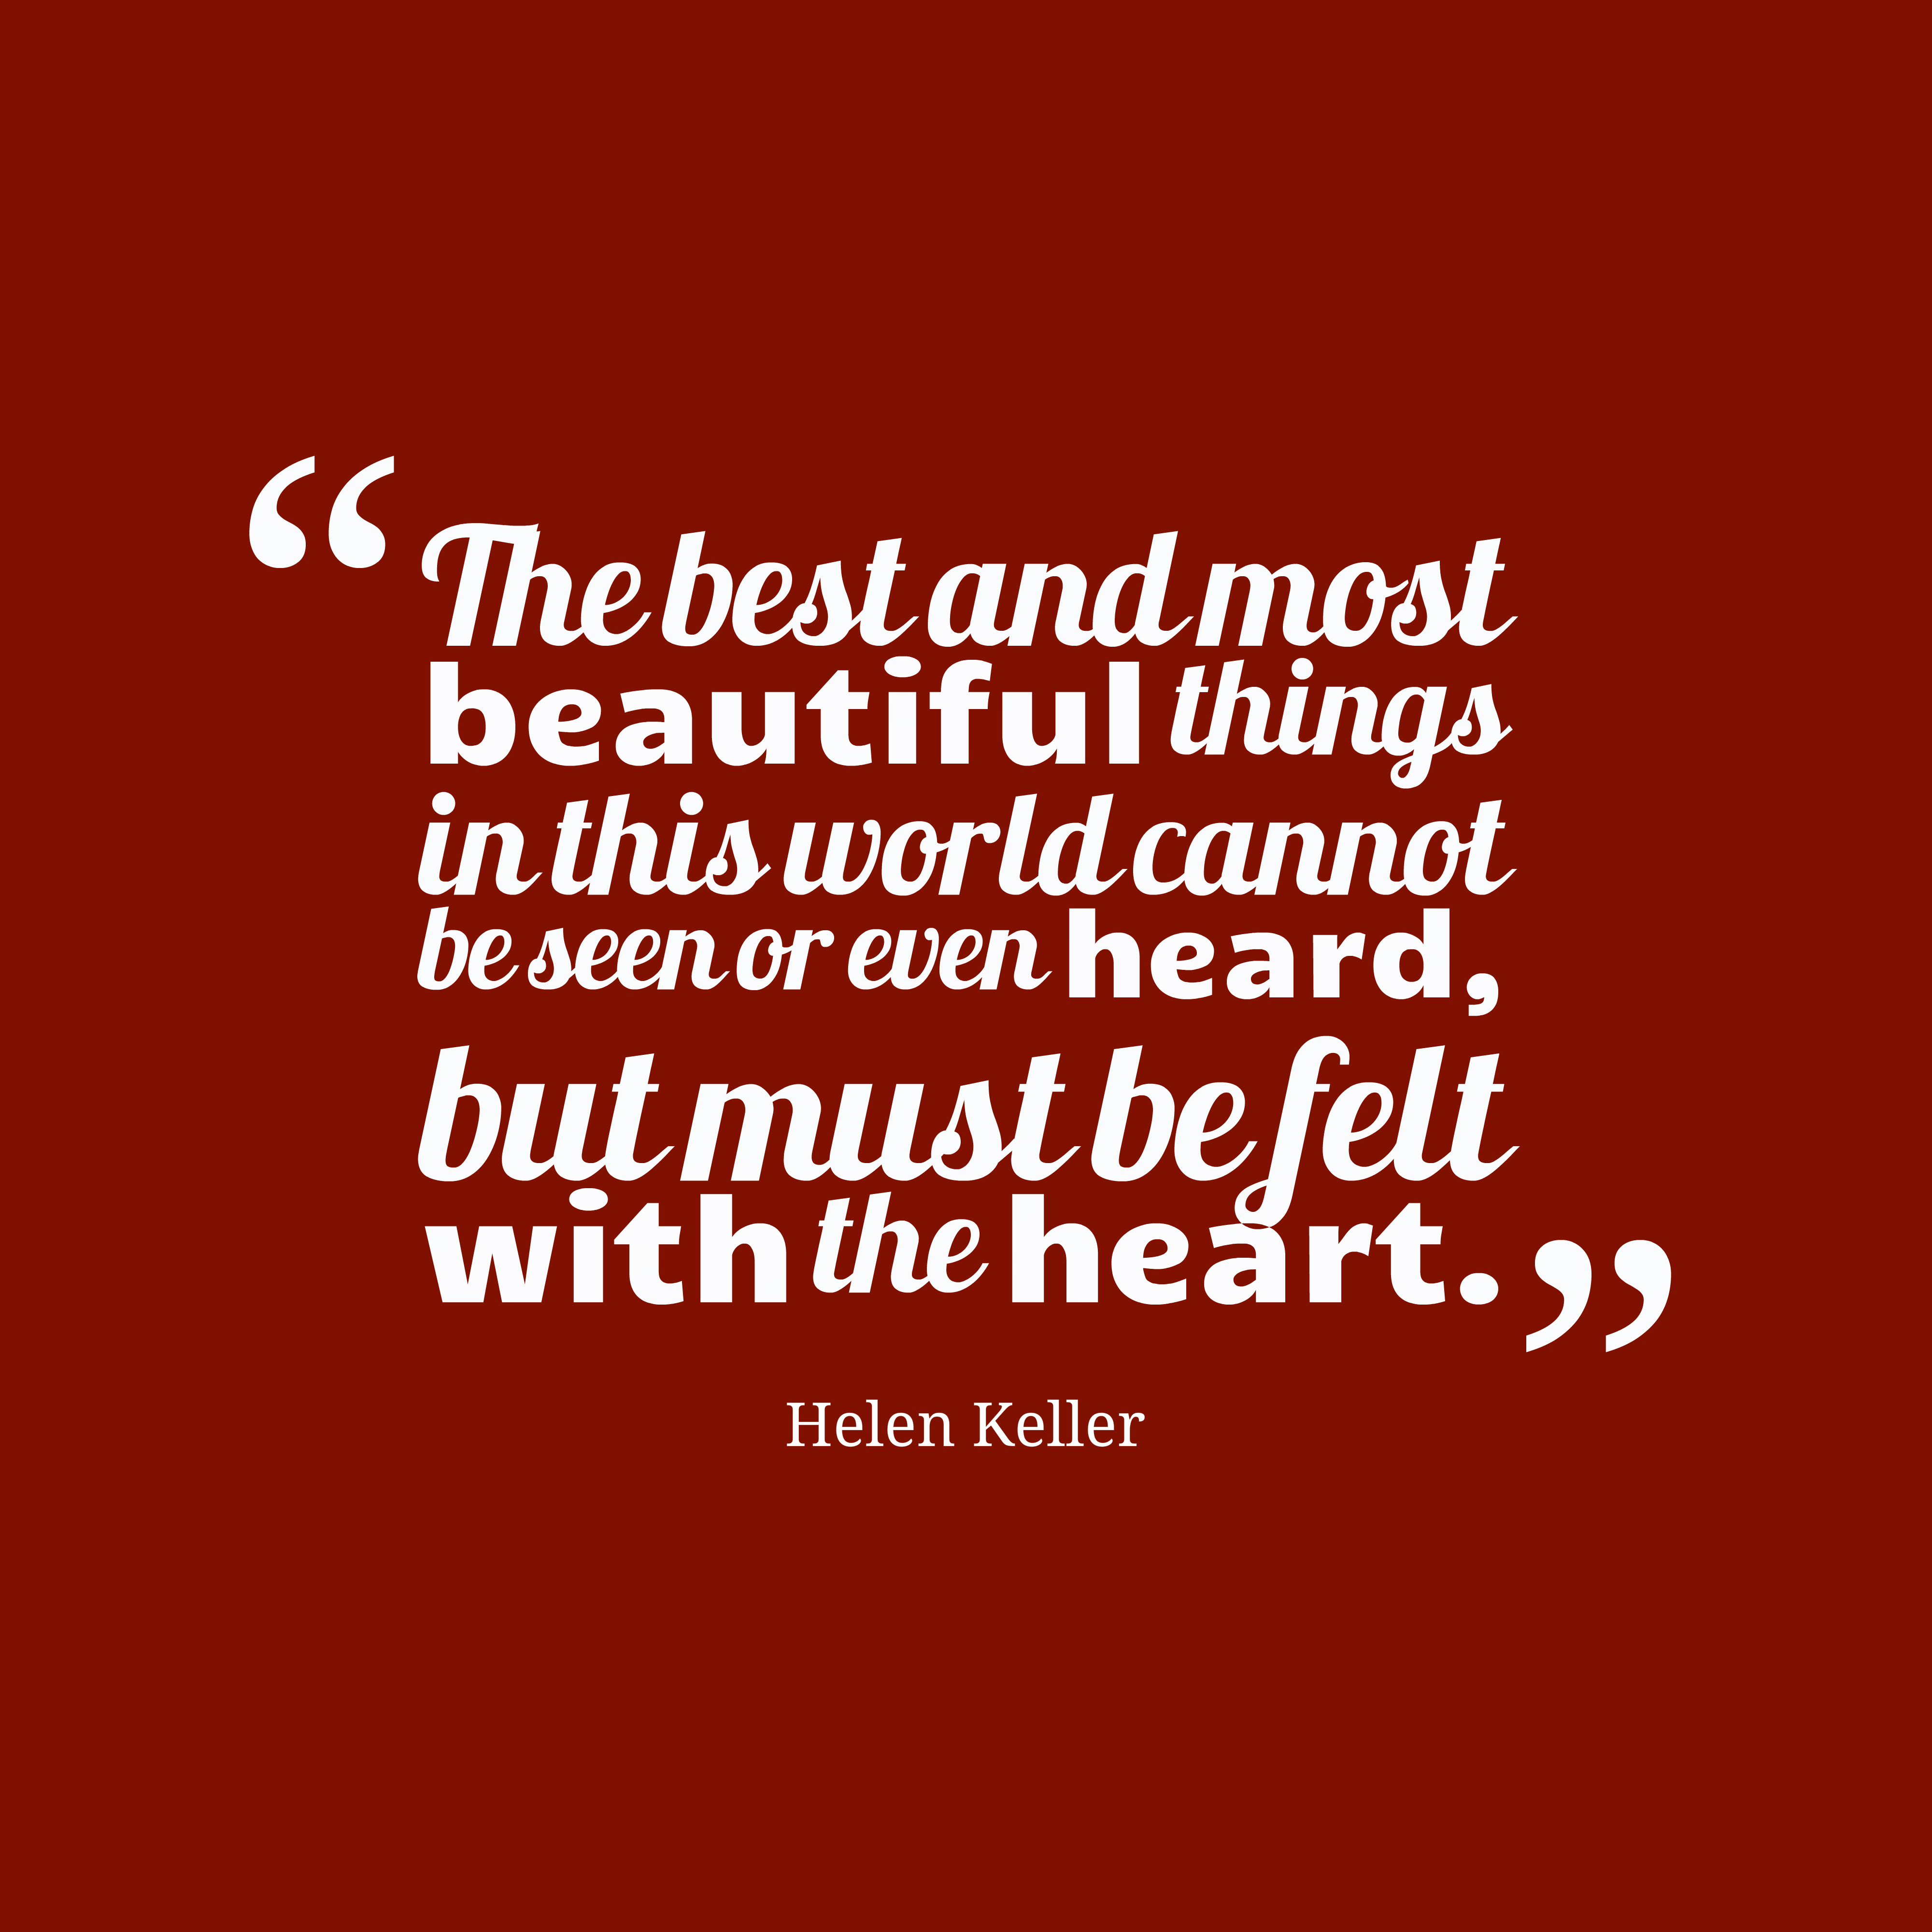 Helen Keller Quote About Beauty